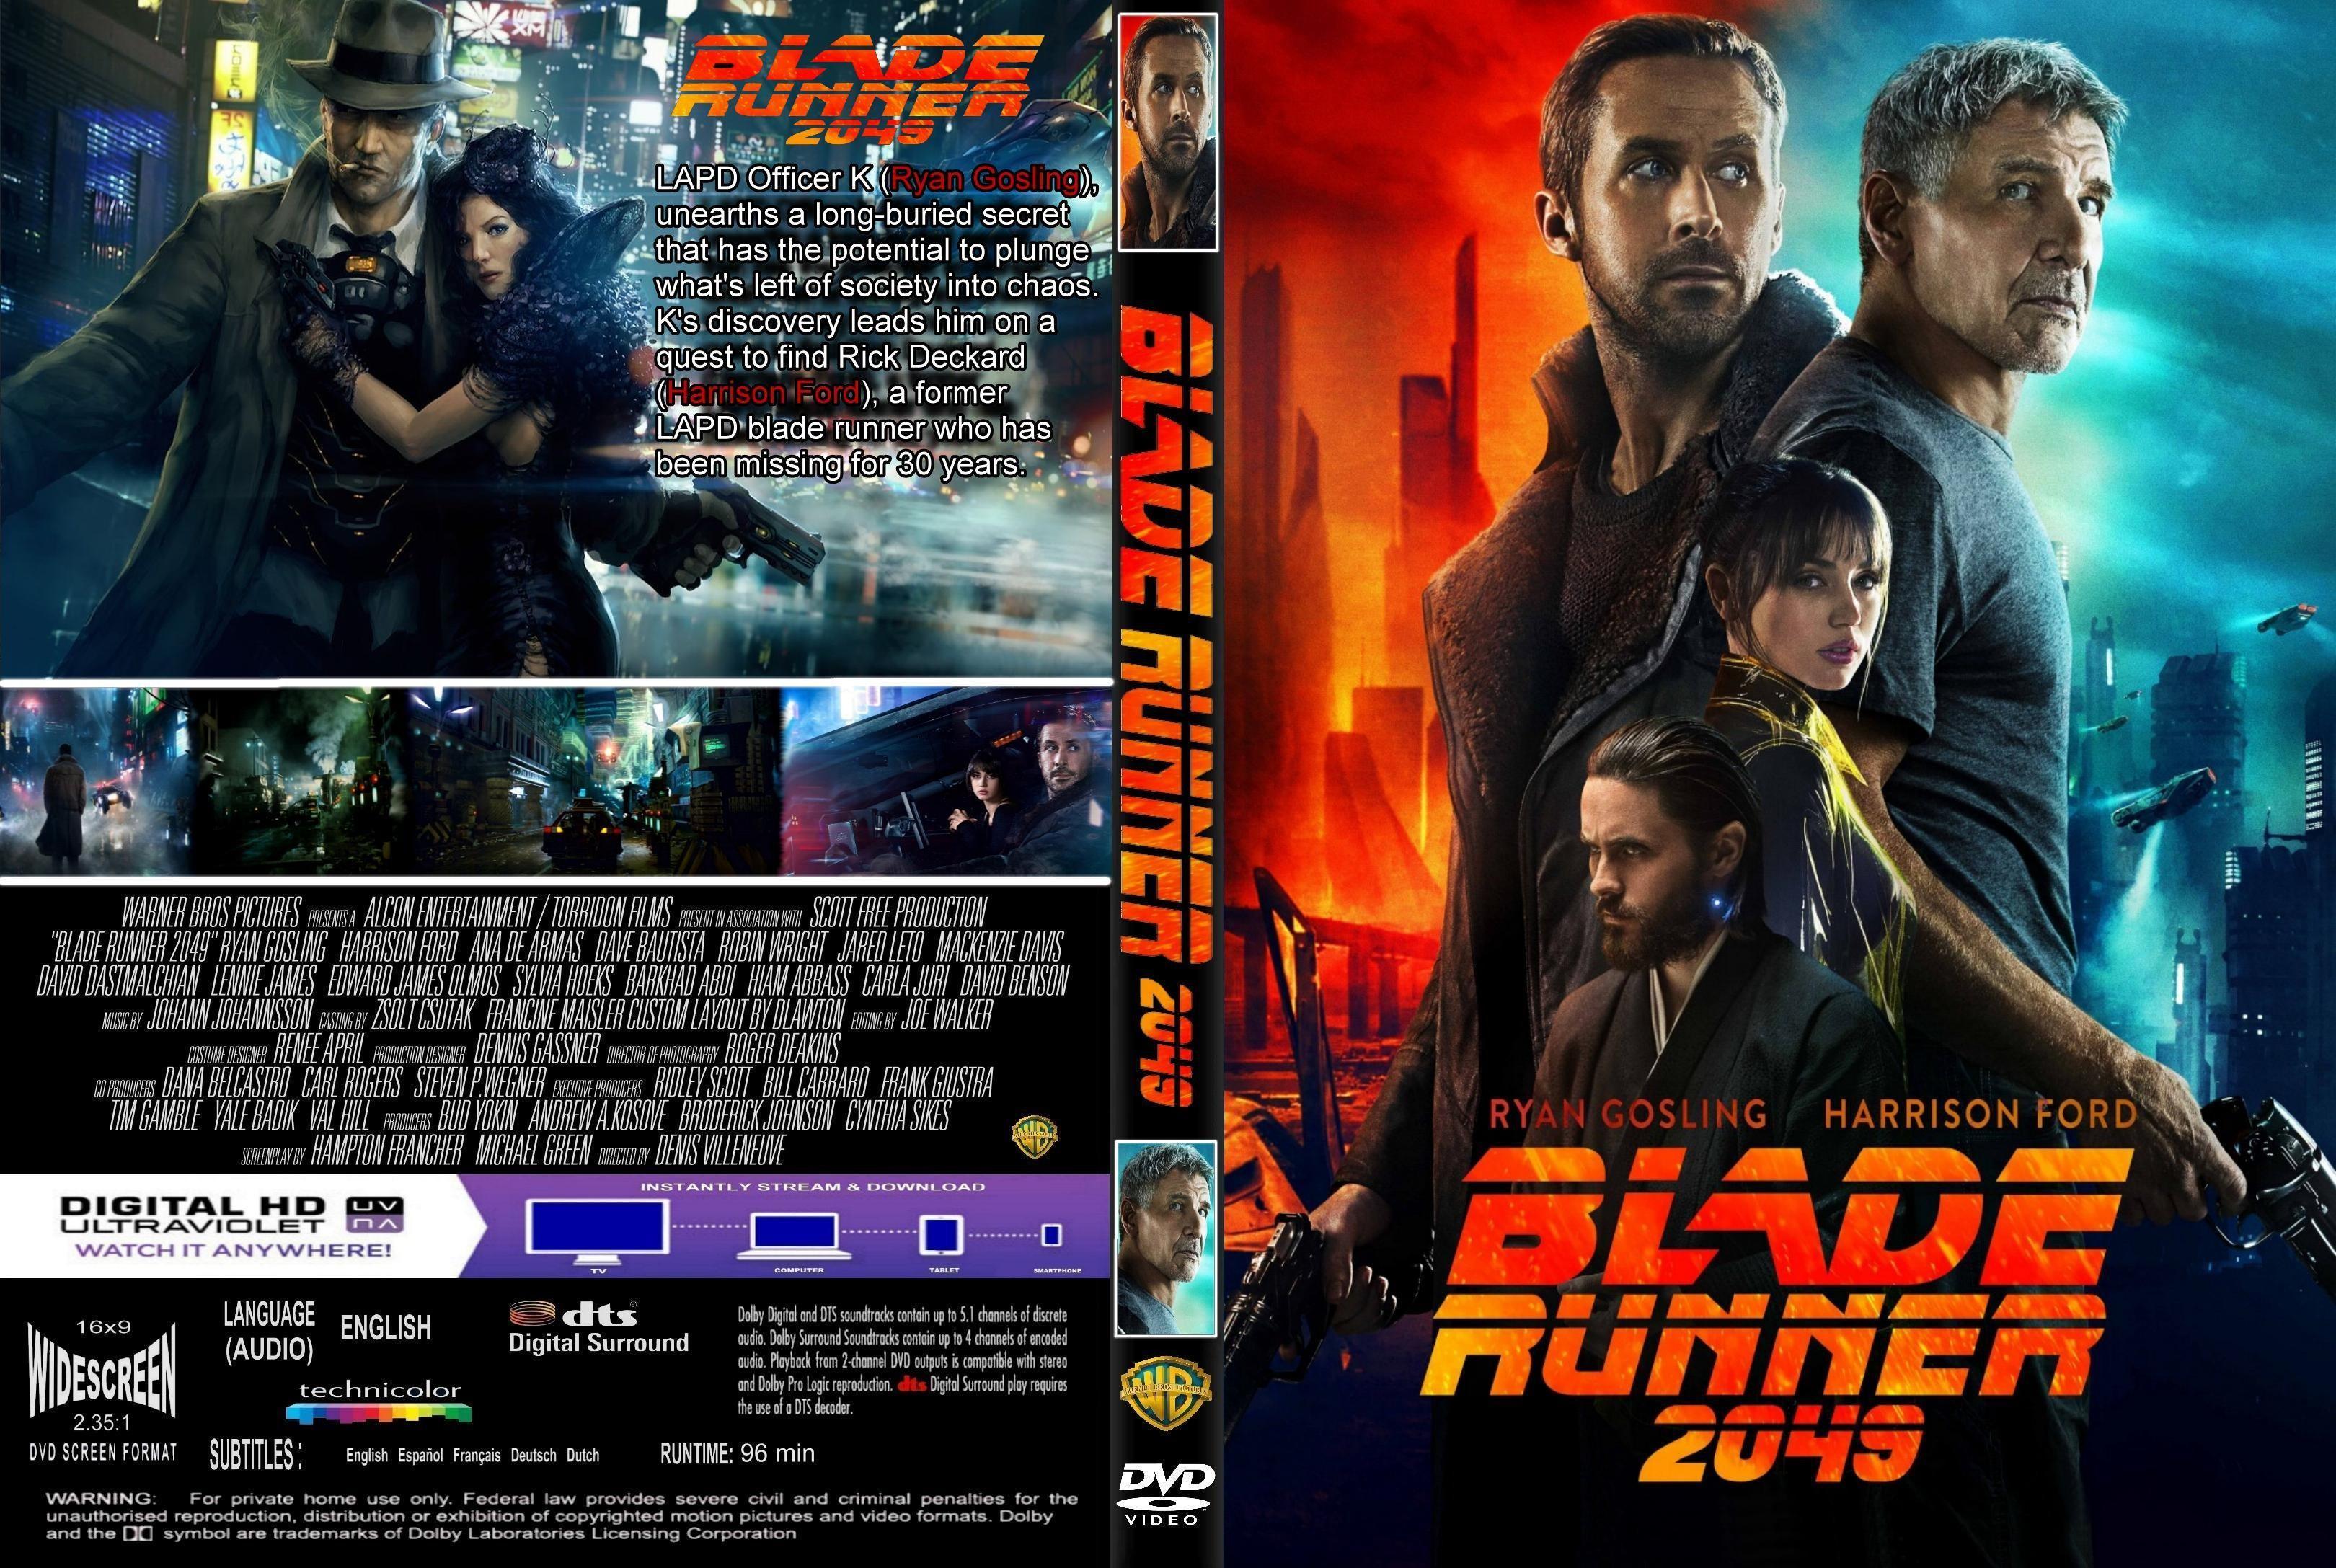 Blade Runner 2049 (2017) lektor PL